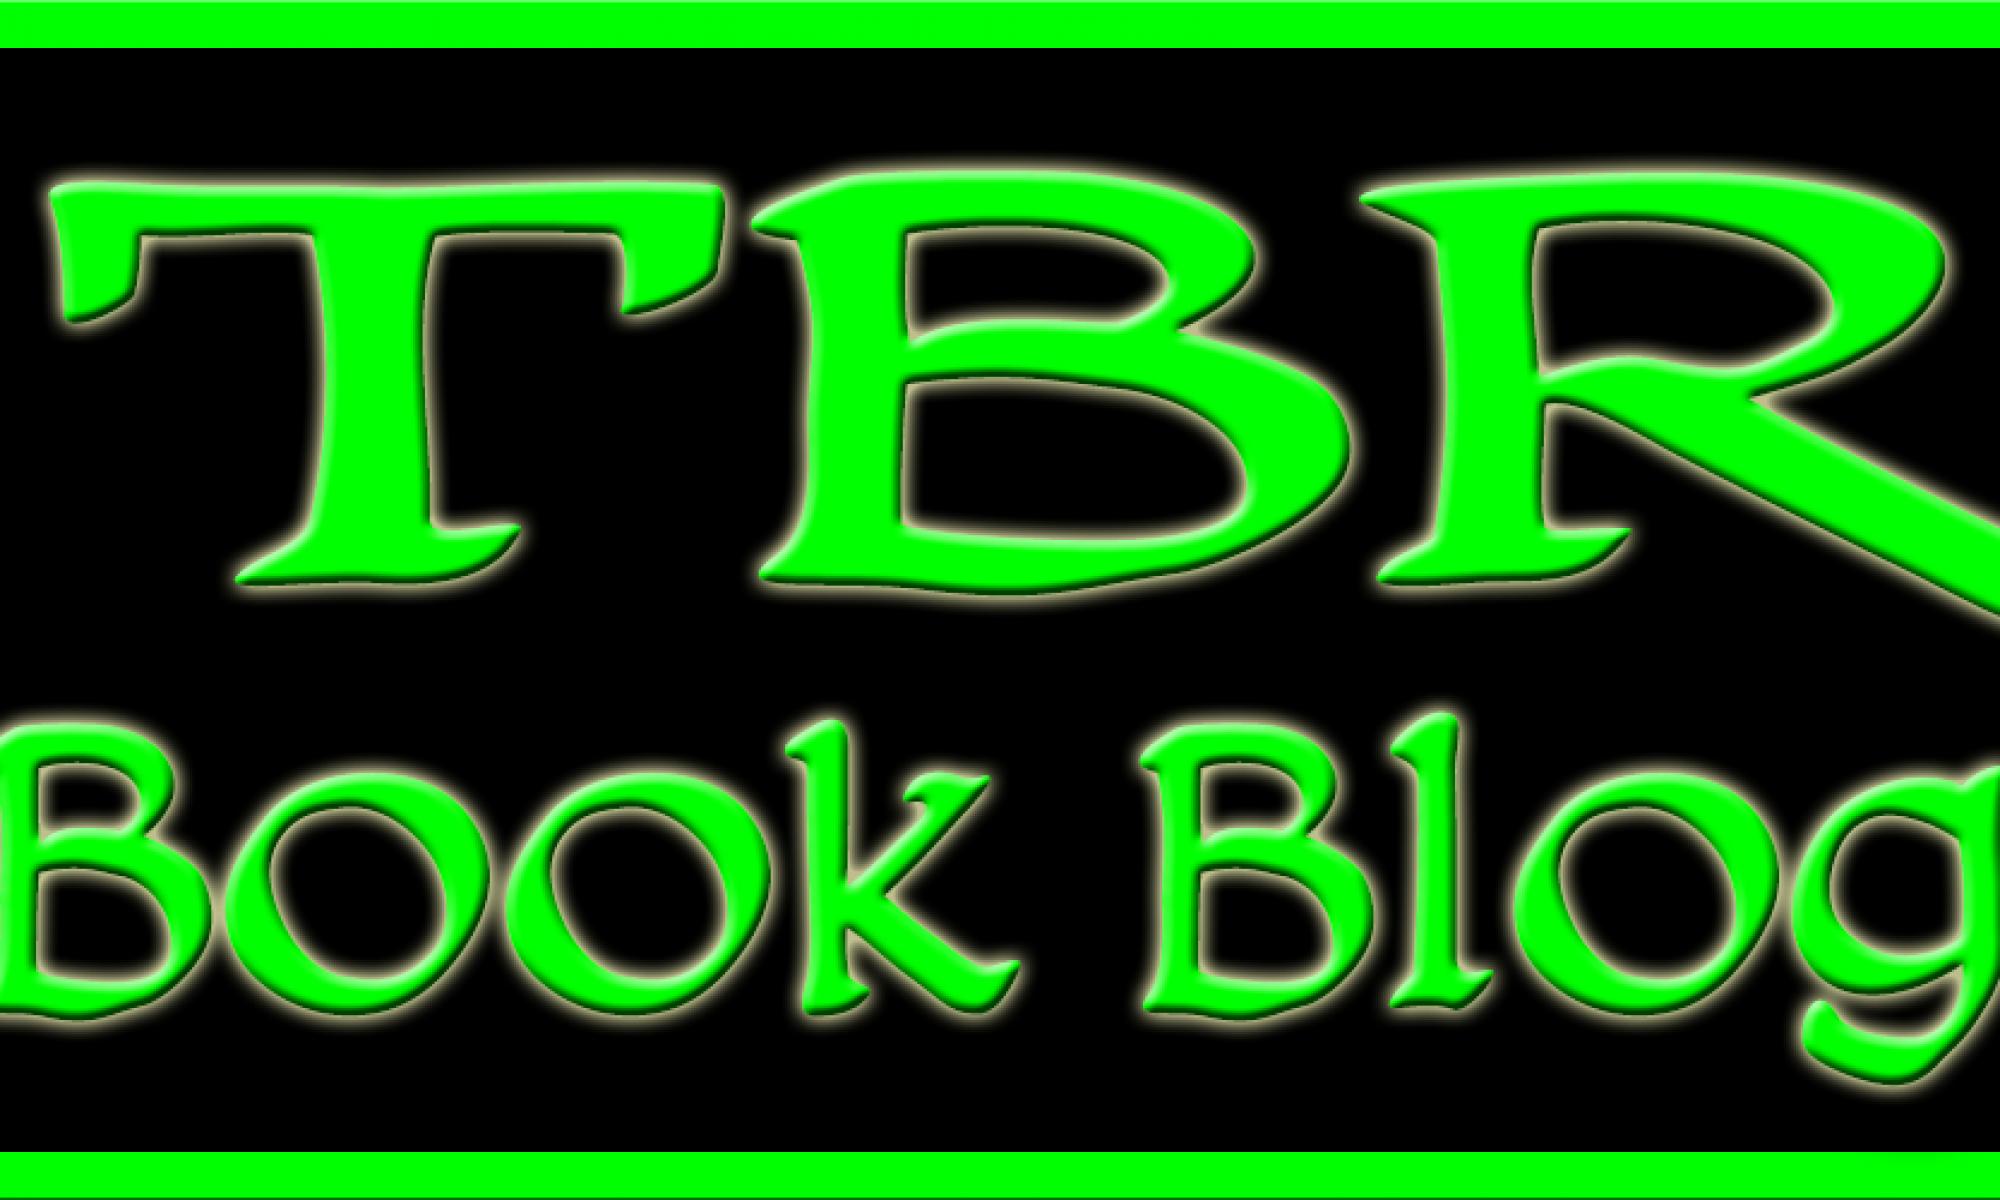 TBR Book Blog